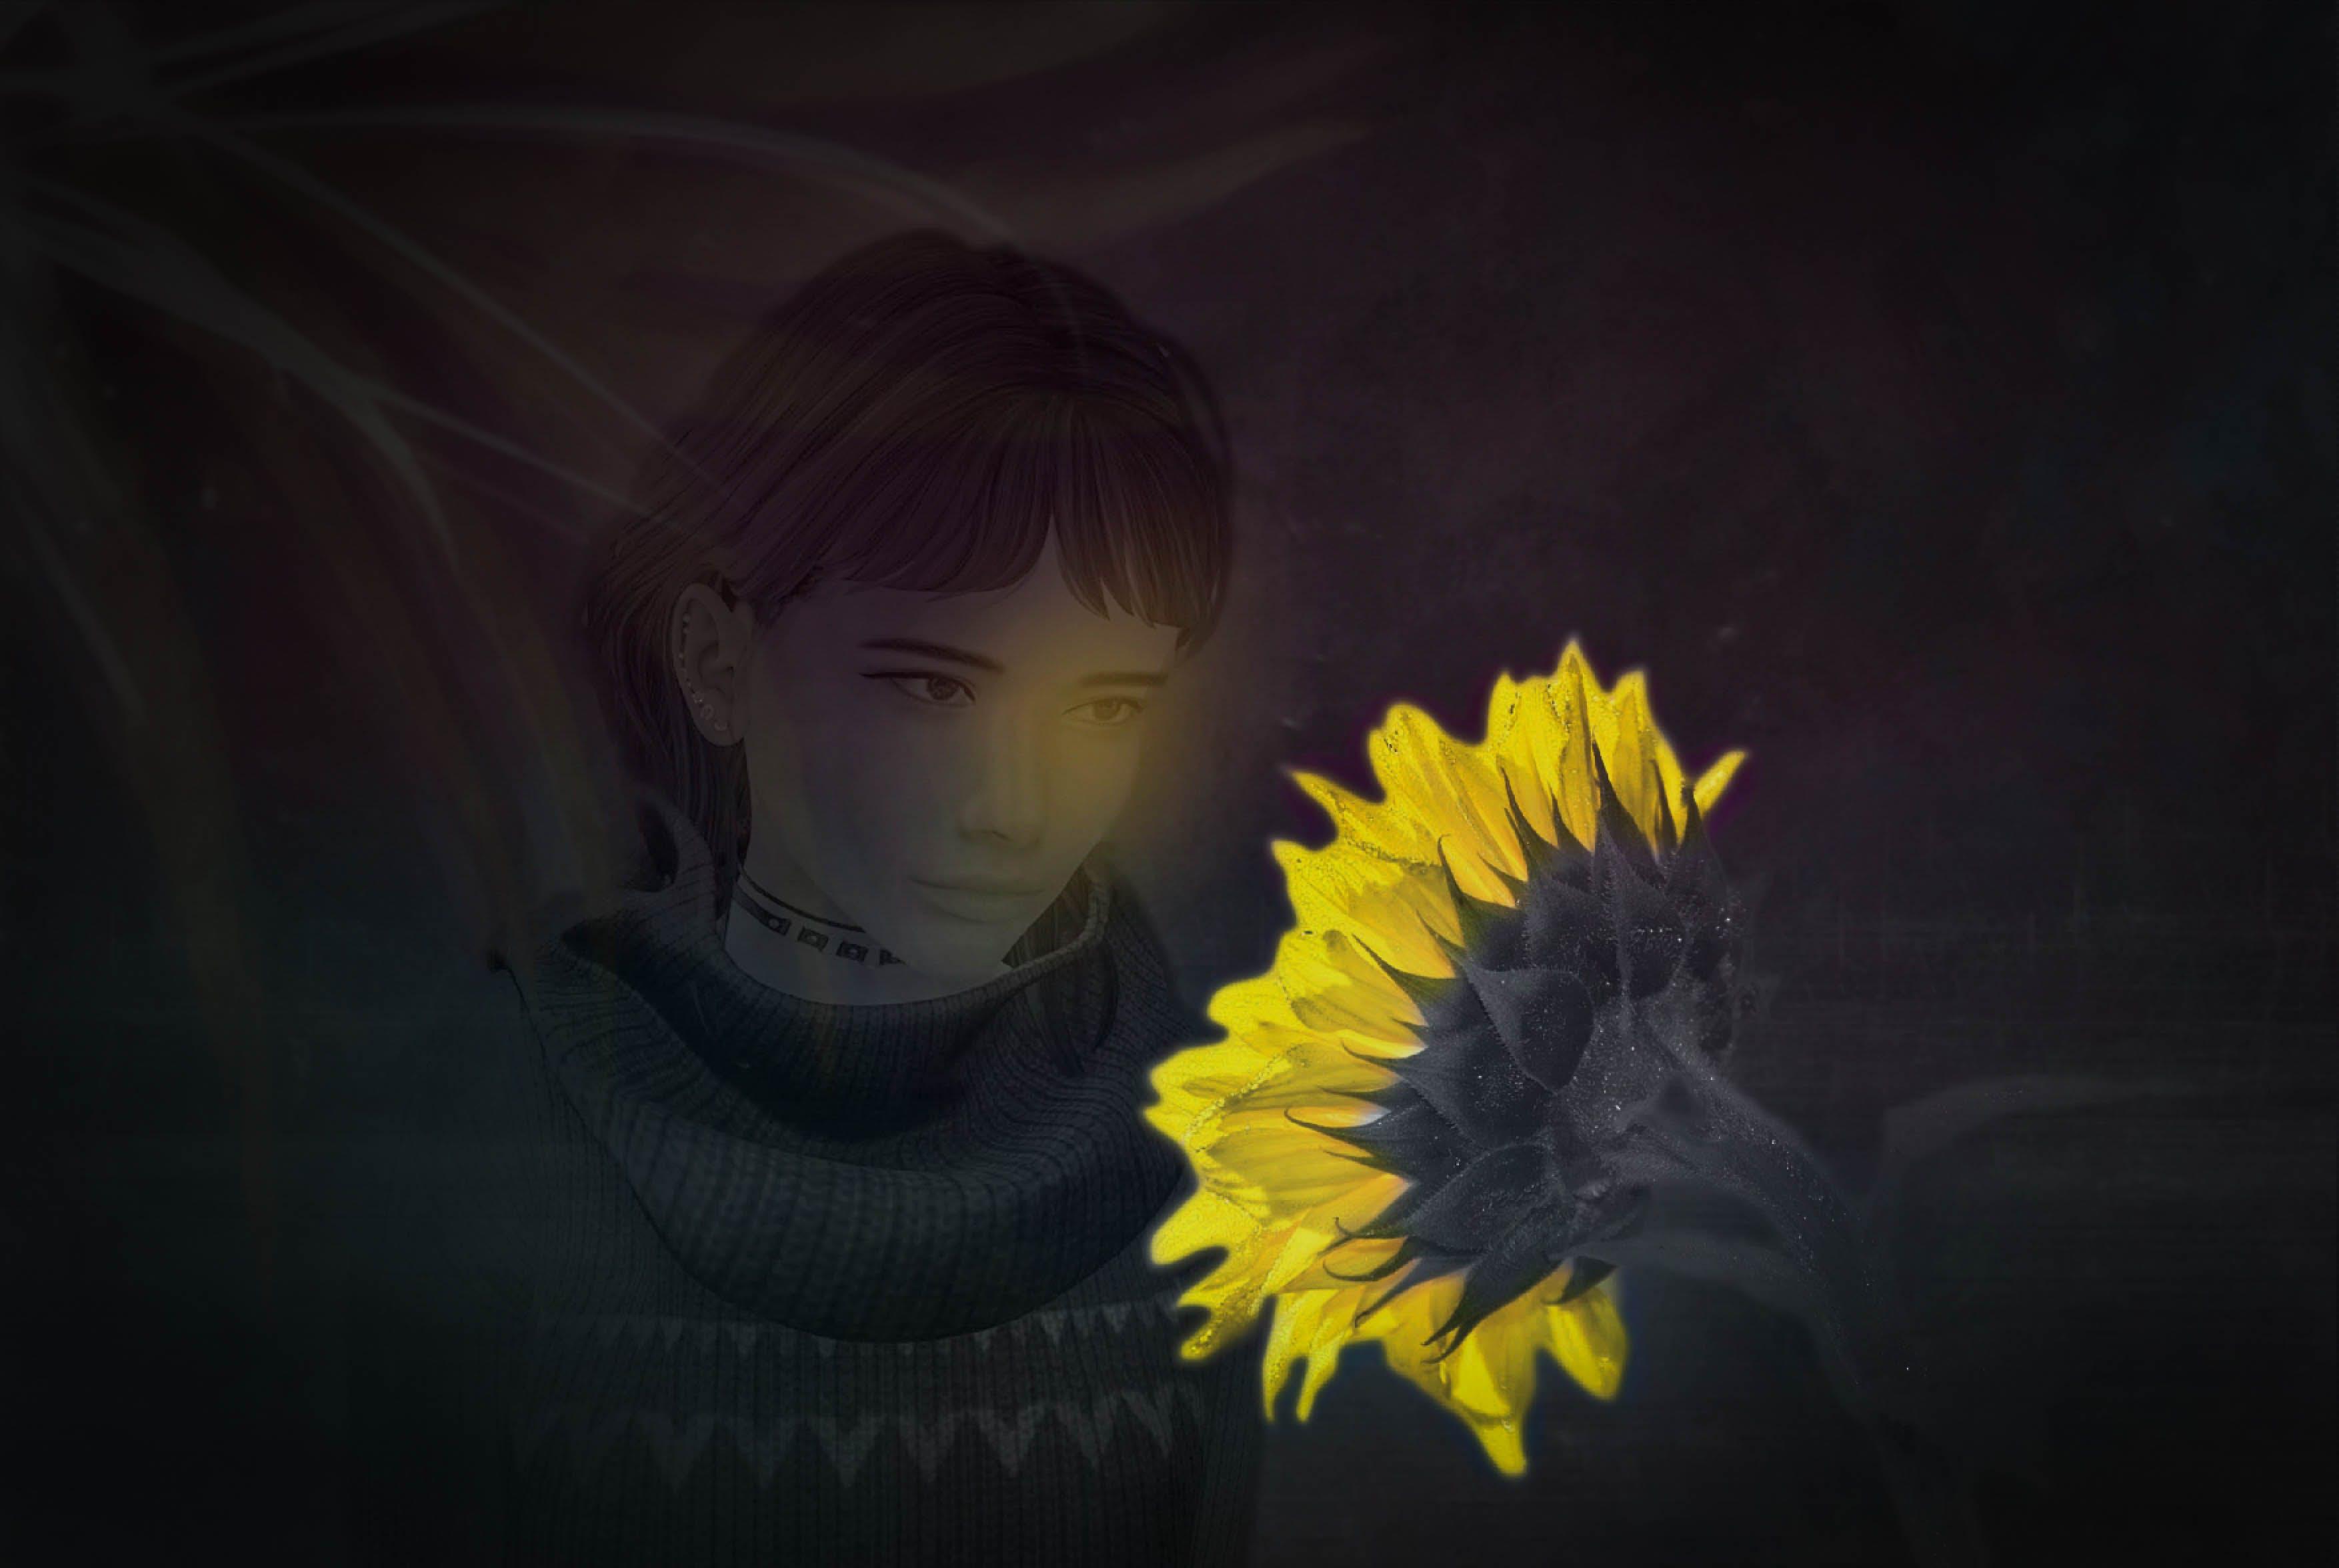 Free stock photo of woman, yellow, sunflower, black and white